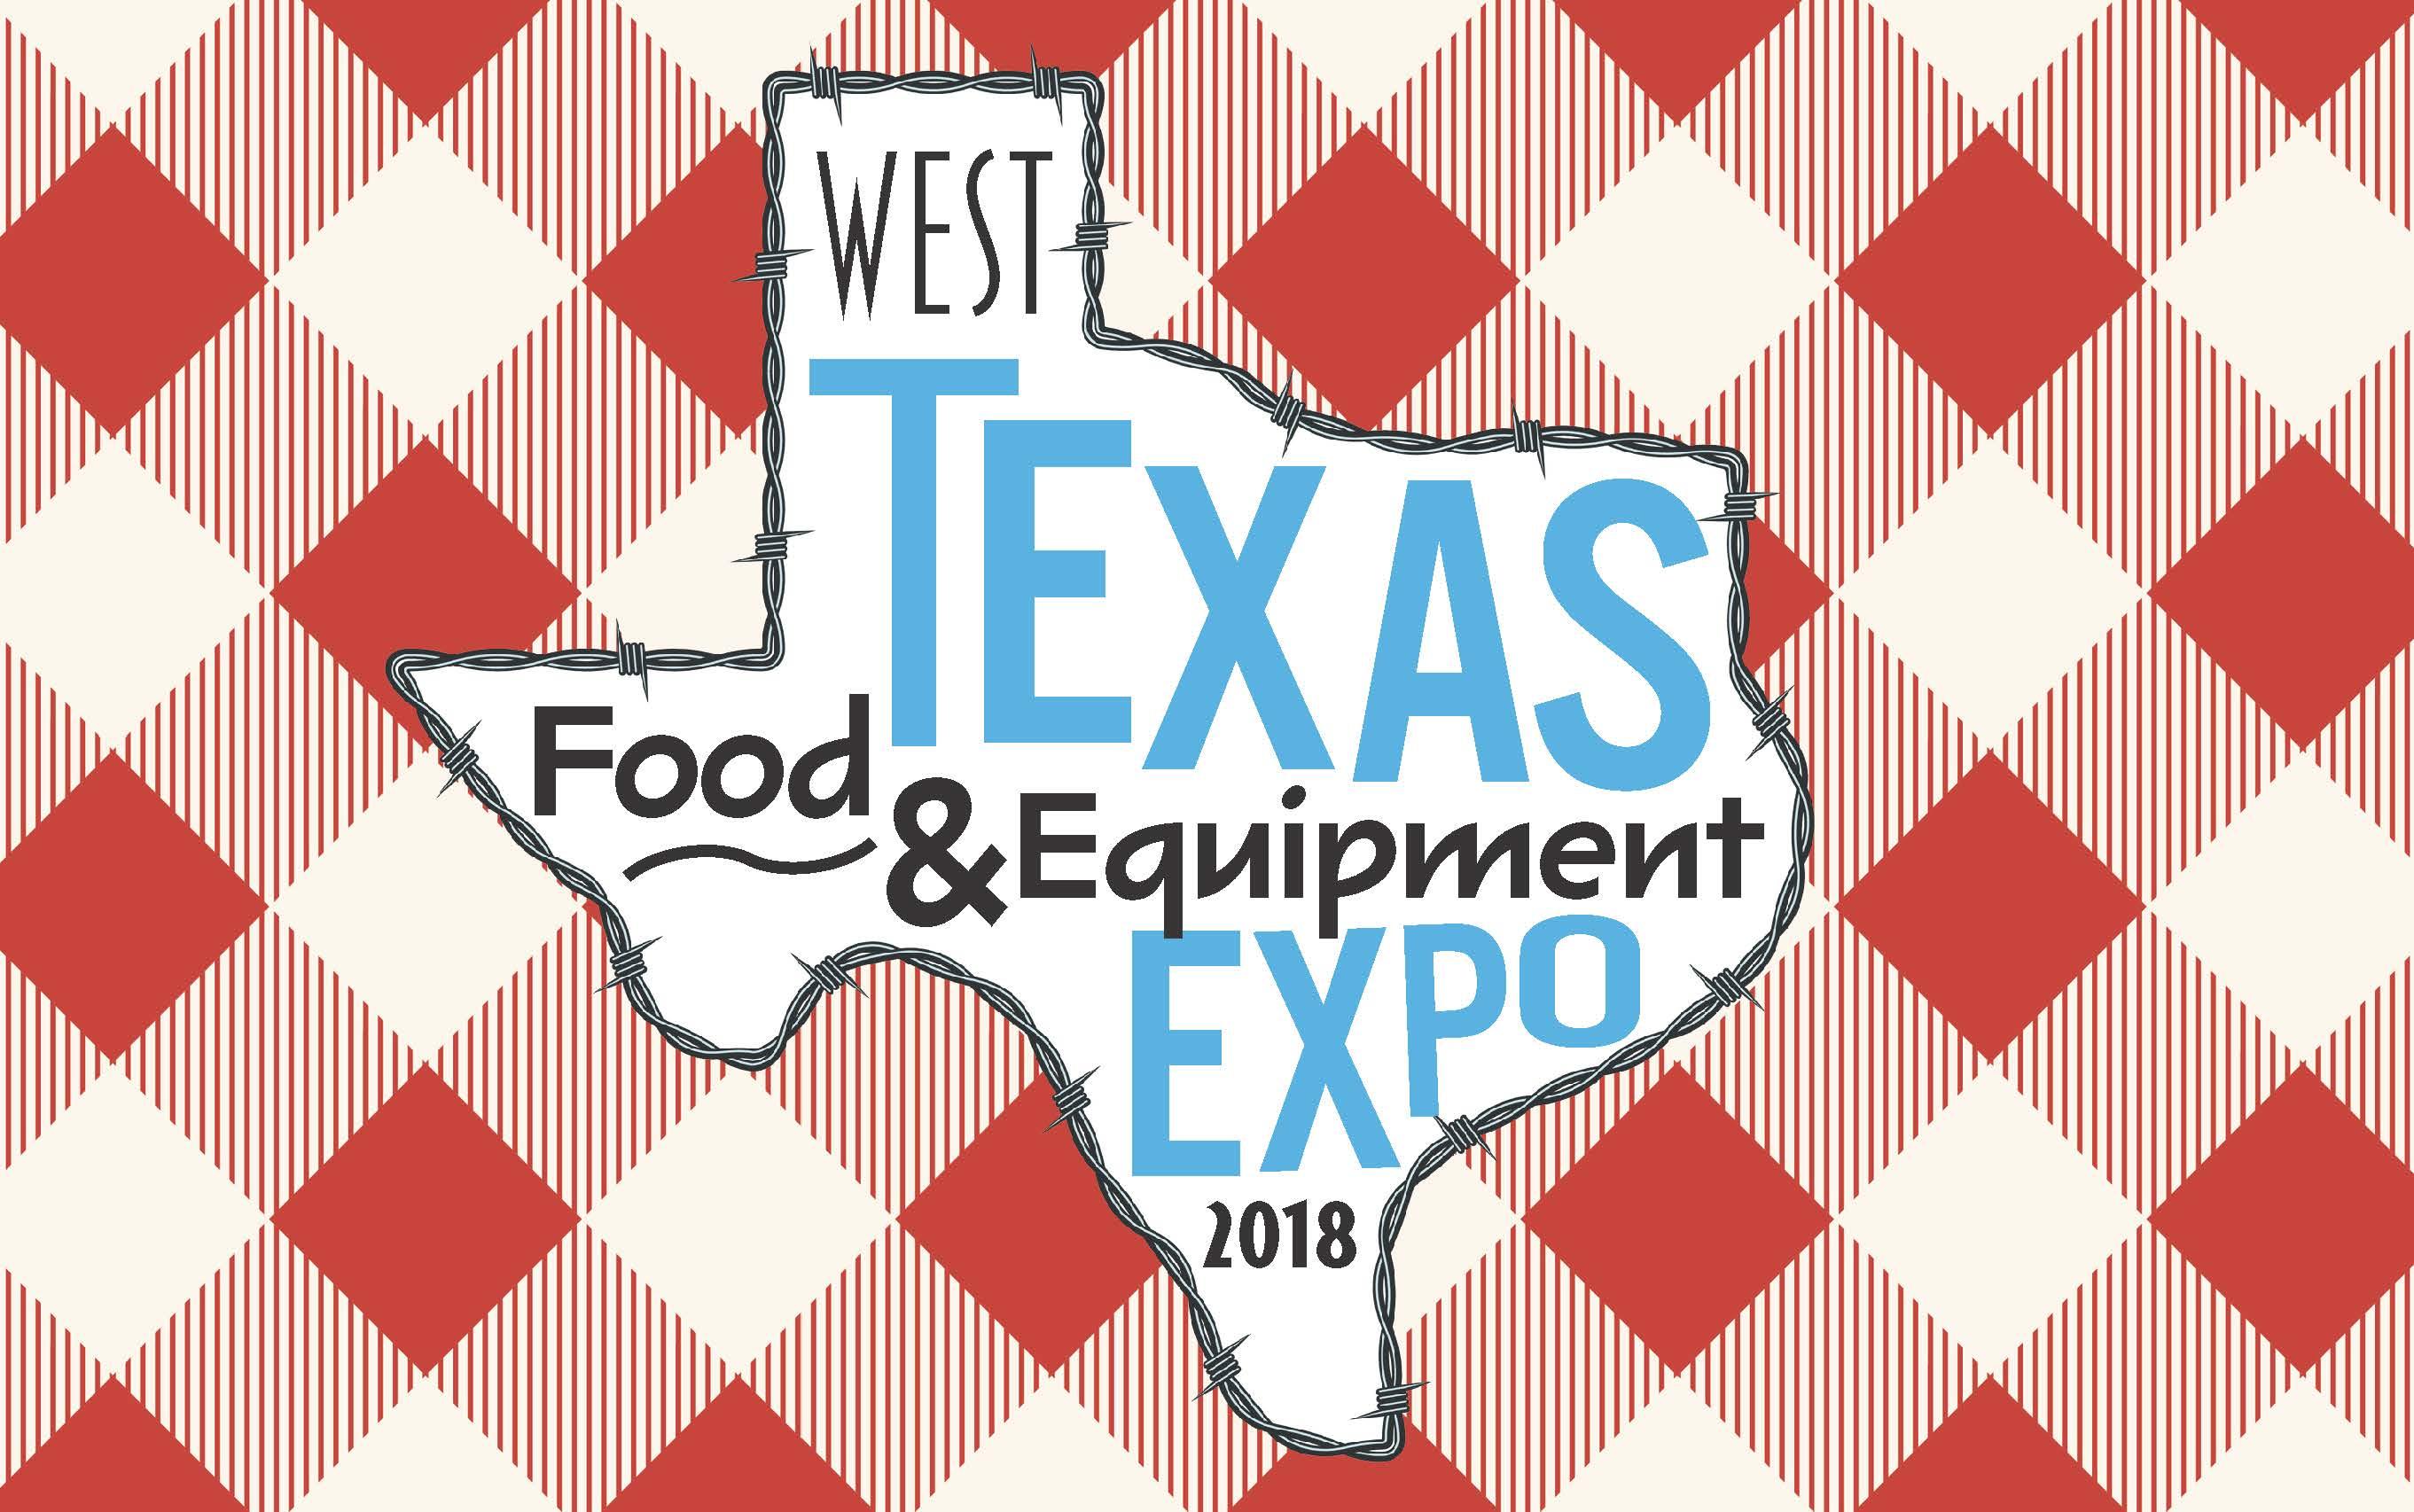 West Texas Food & Equipment Expo